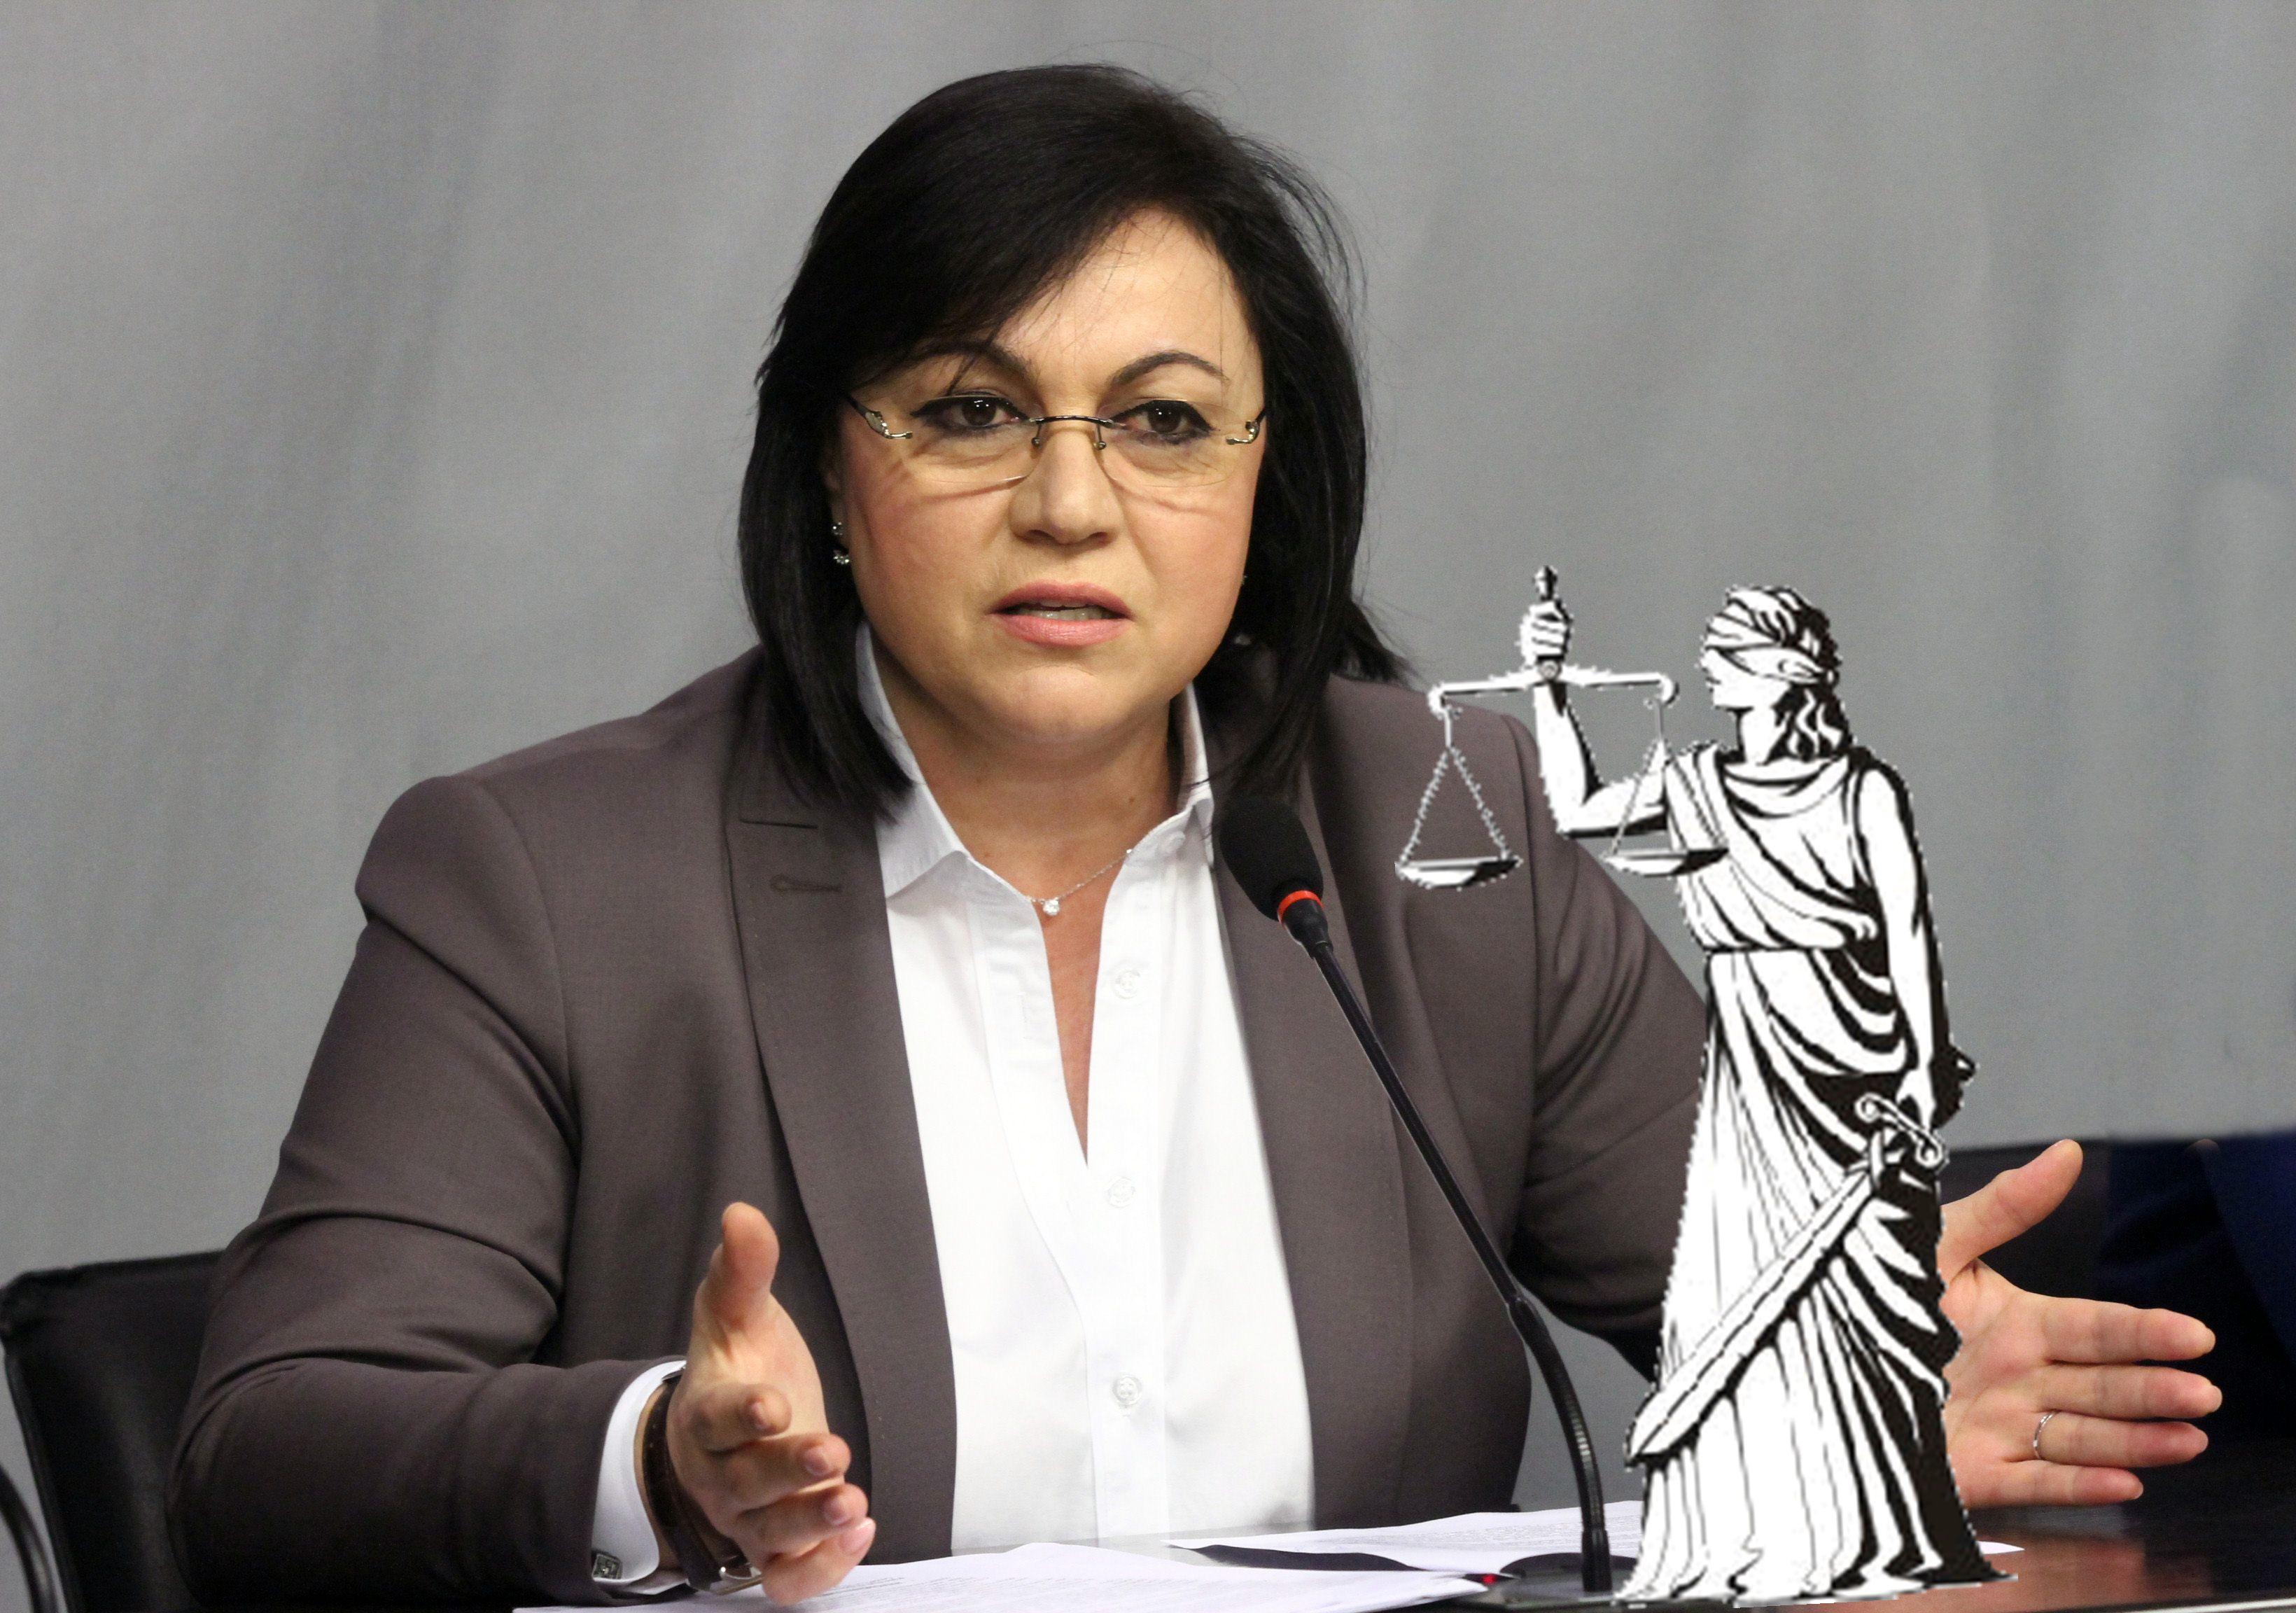 Корнелия Нинова избухна за Борисов и Цветанов заради делата в Страсбург